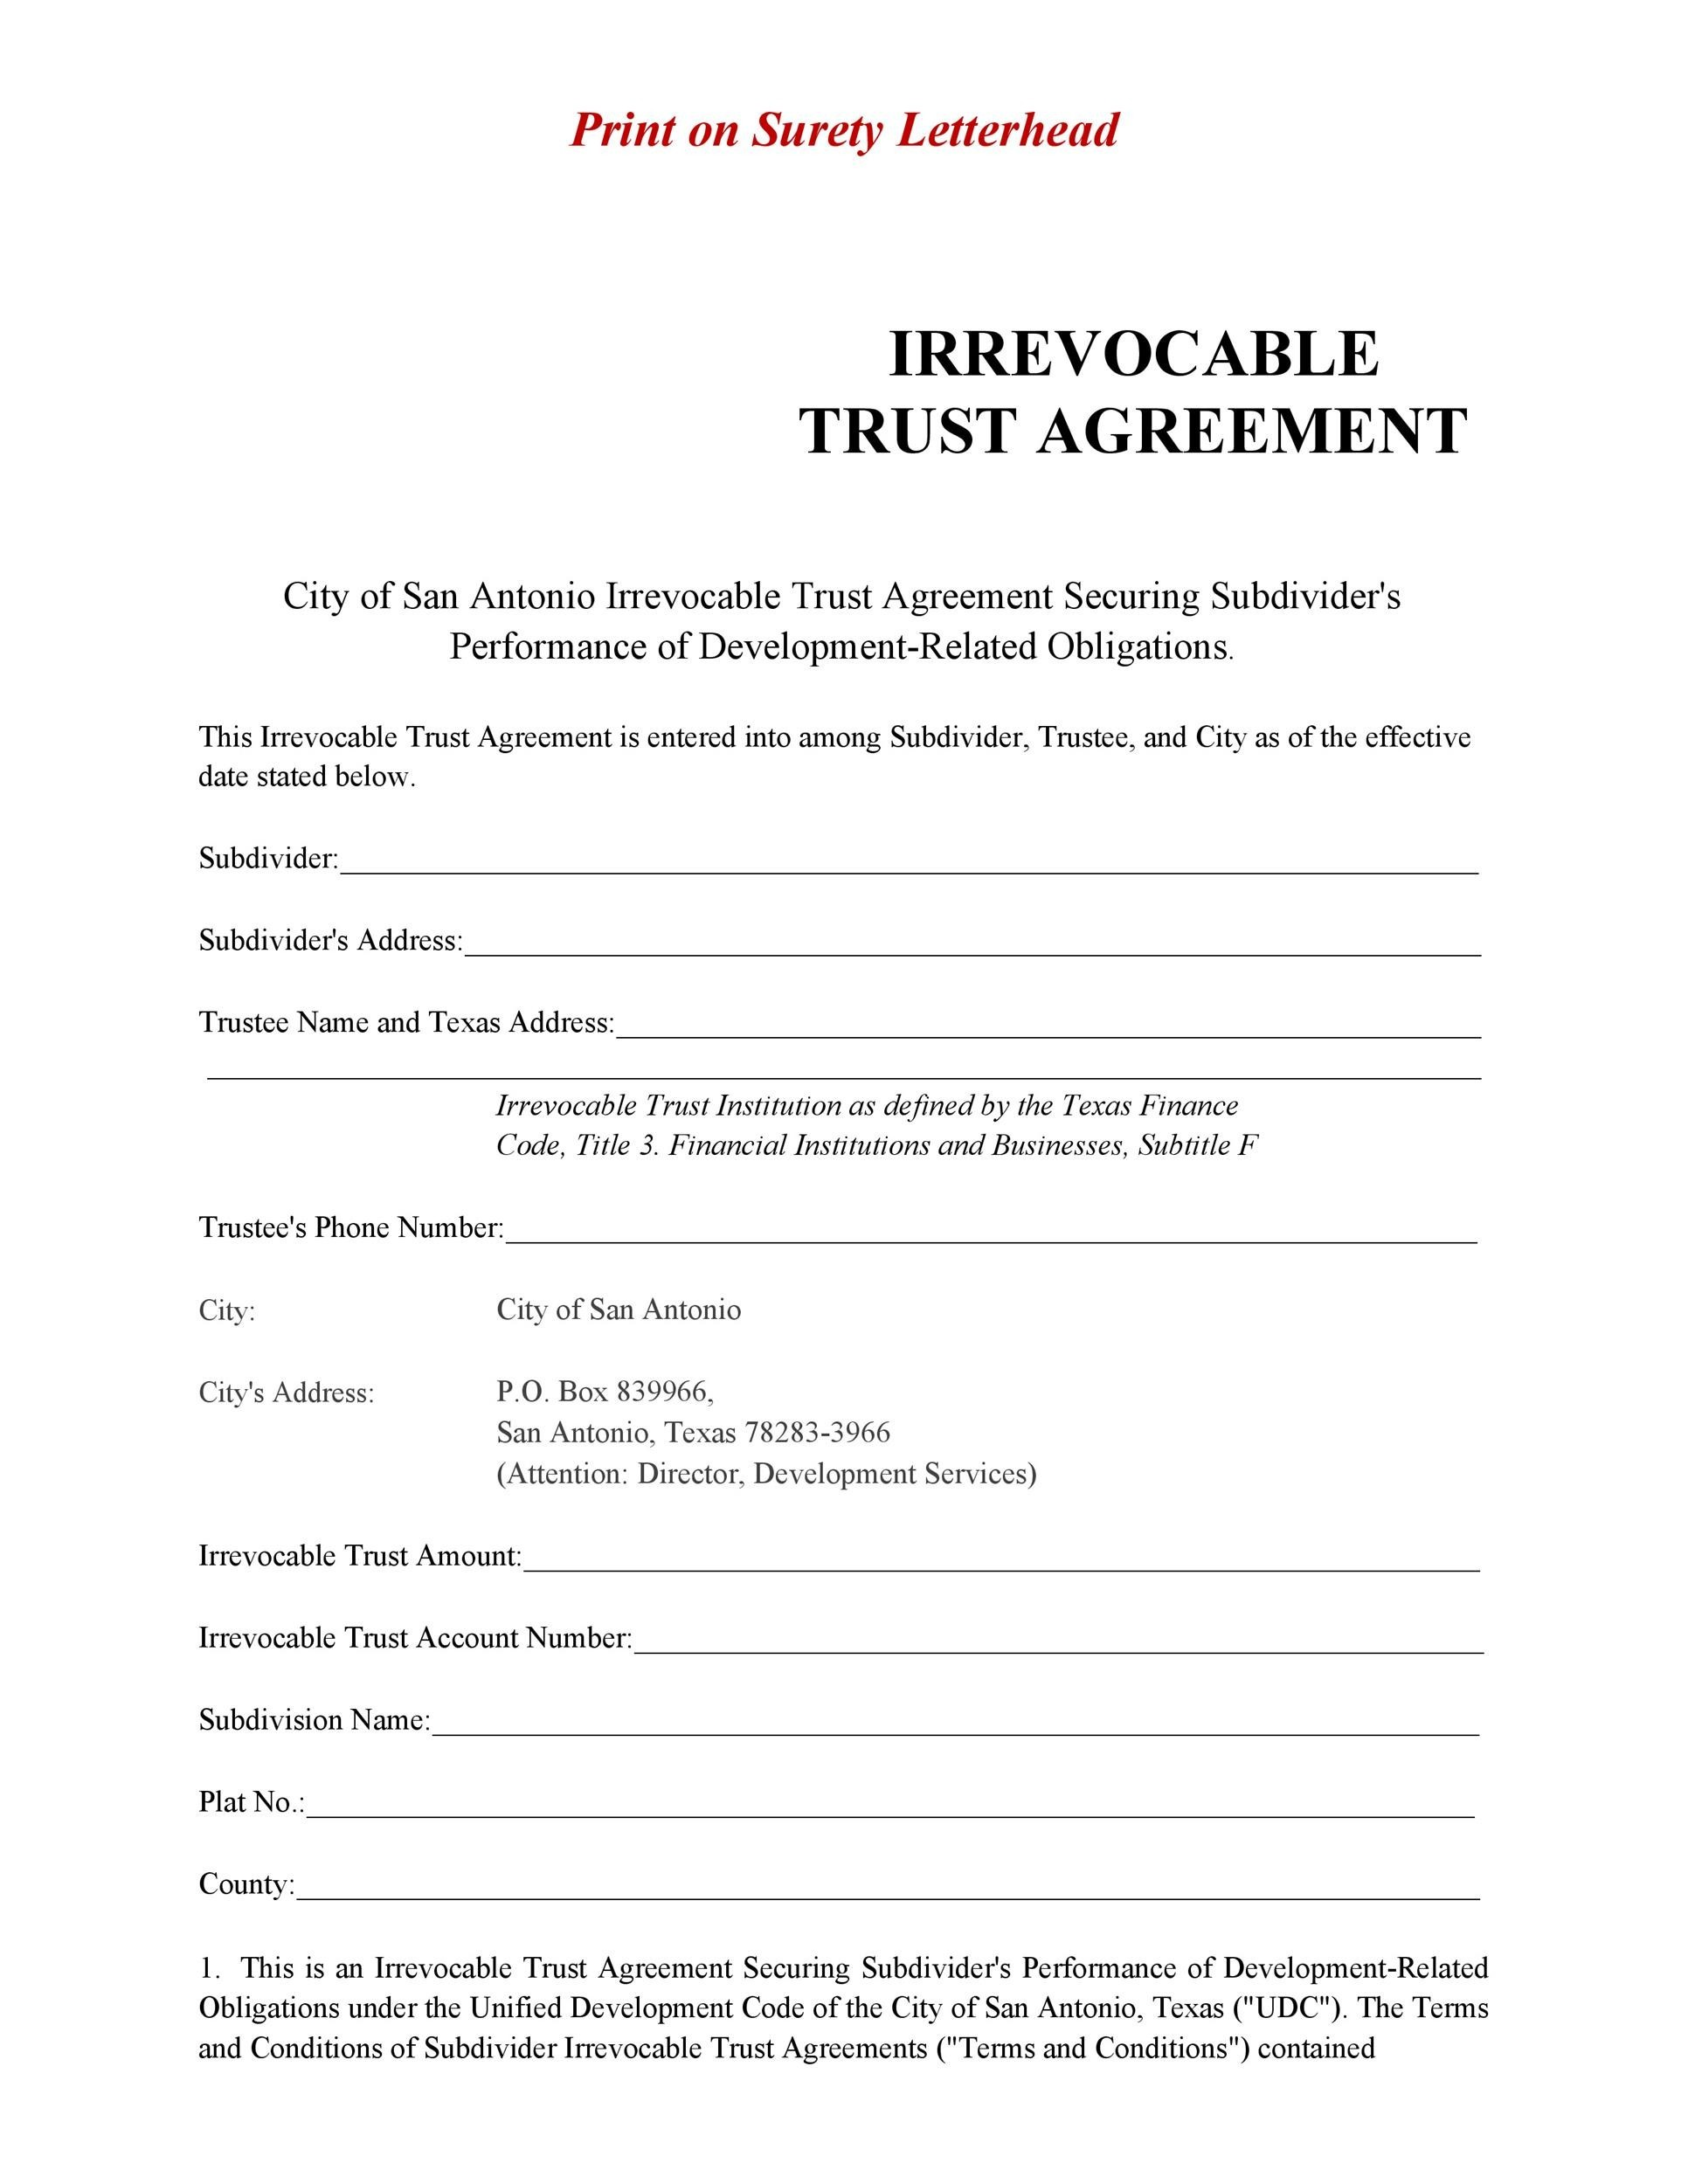 Free trust agreement 46